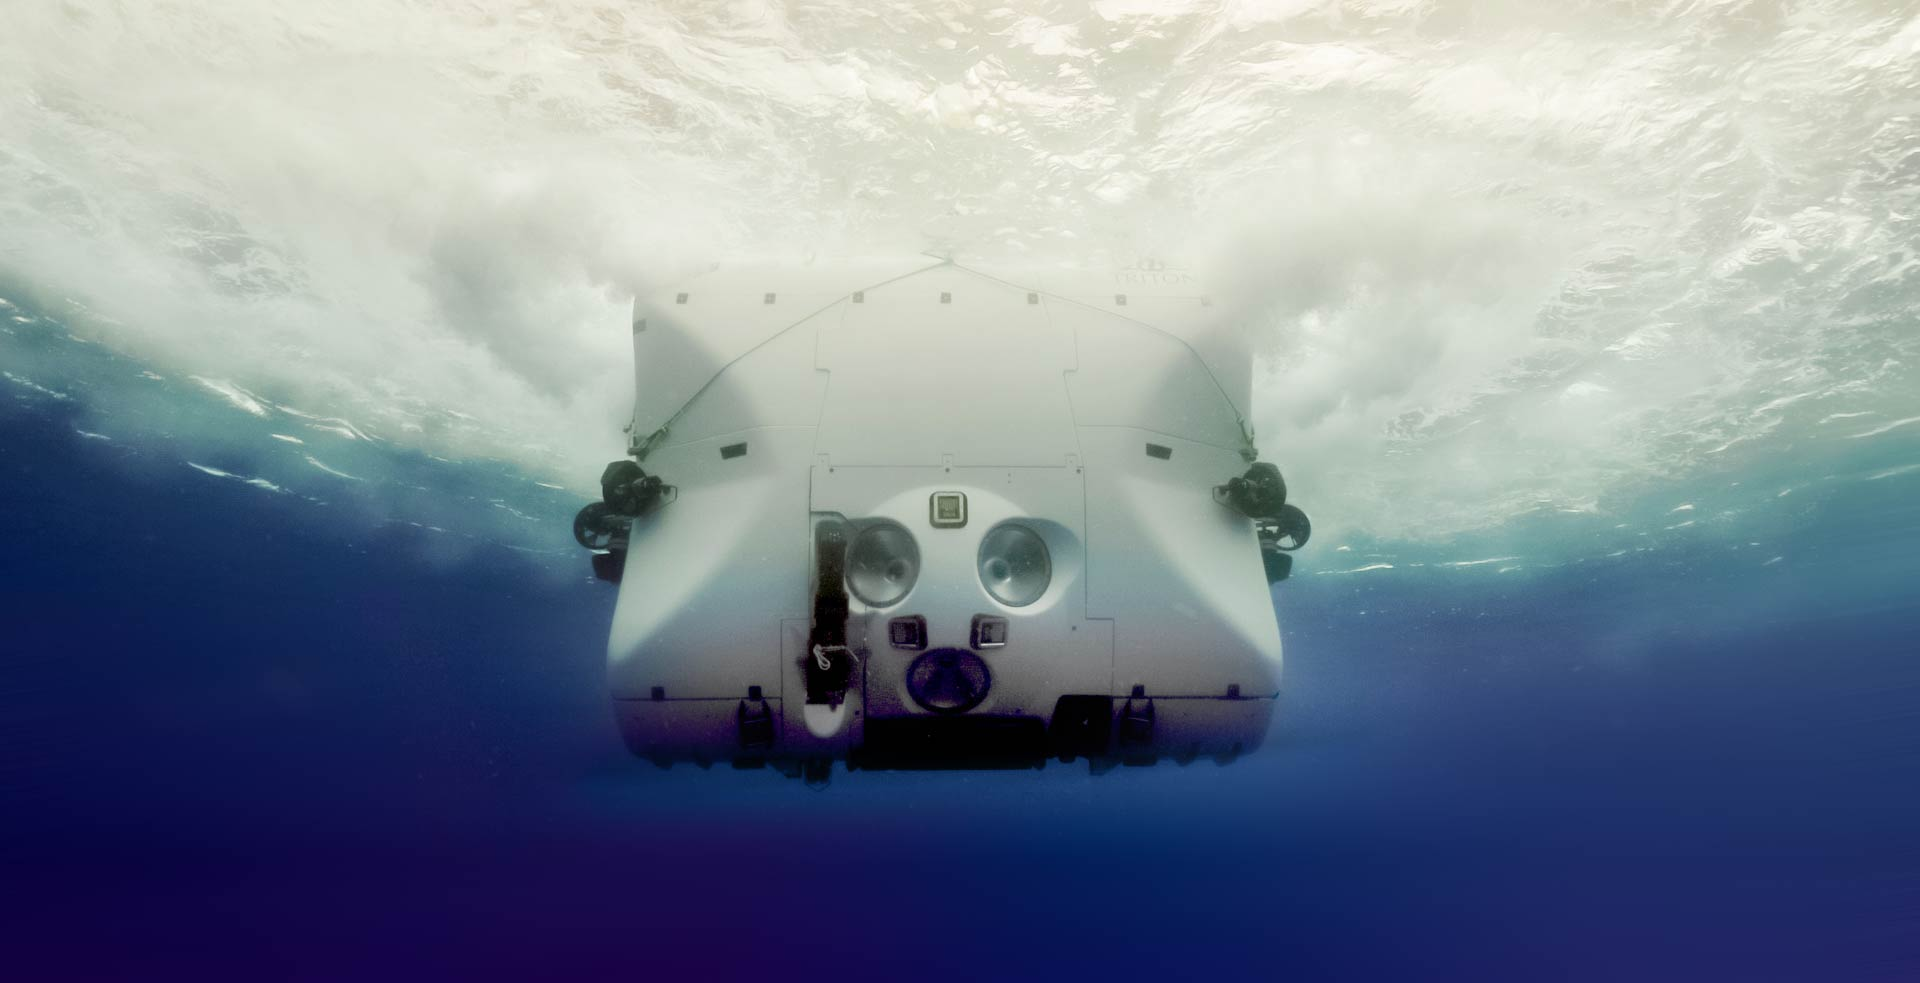 TRITON 33000/2 - Full Ocean Depth certified submersible